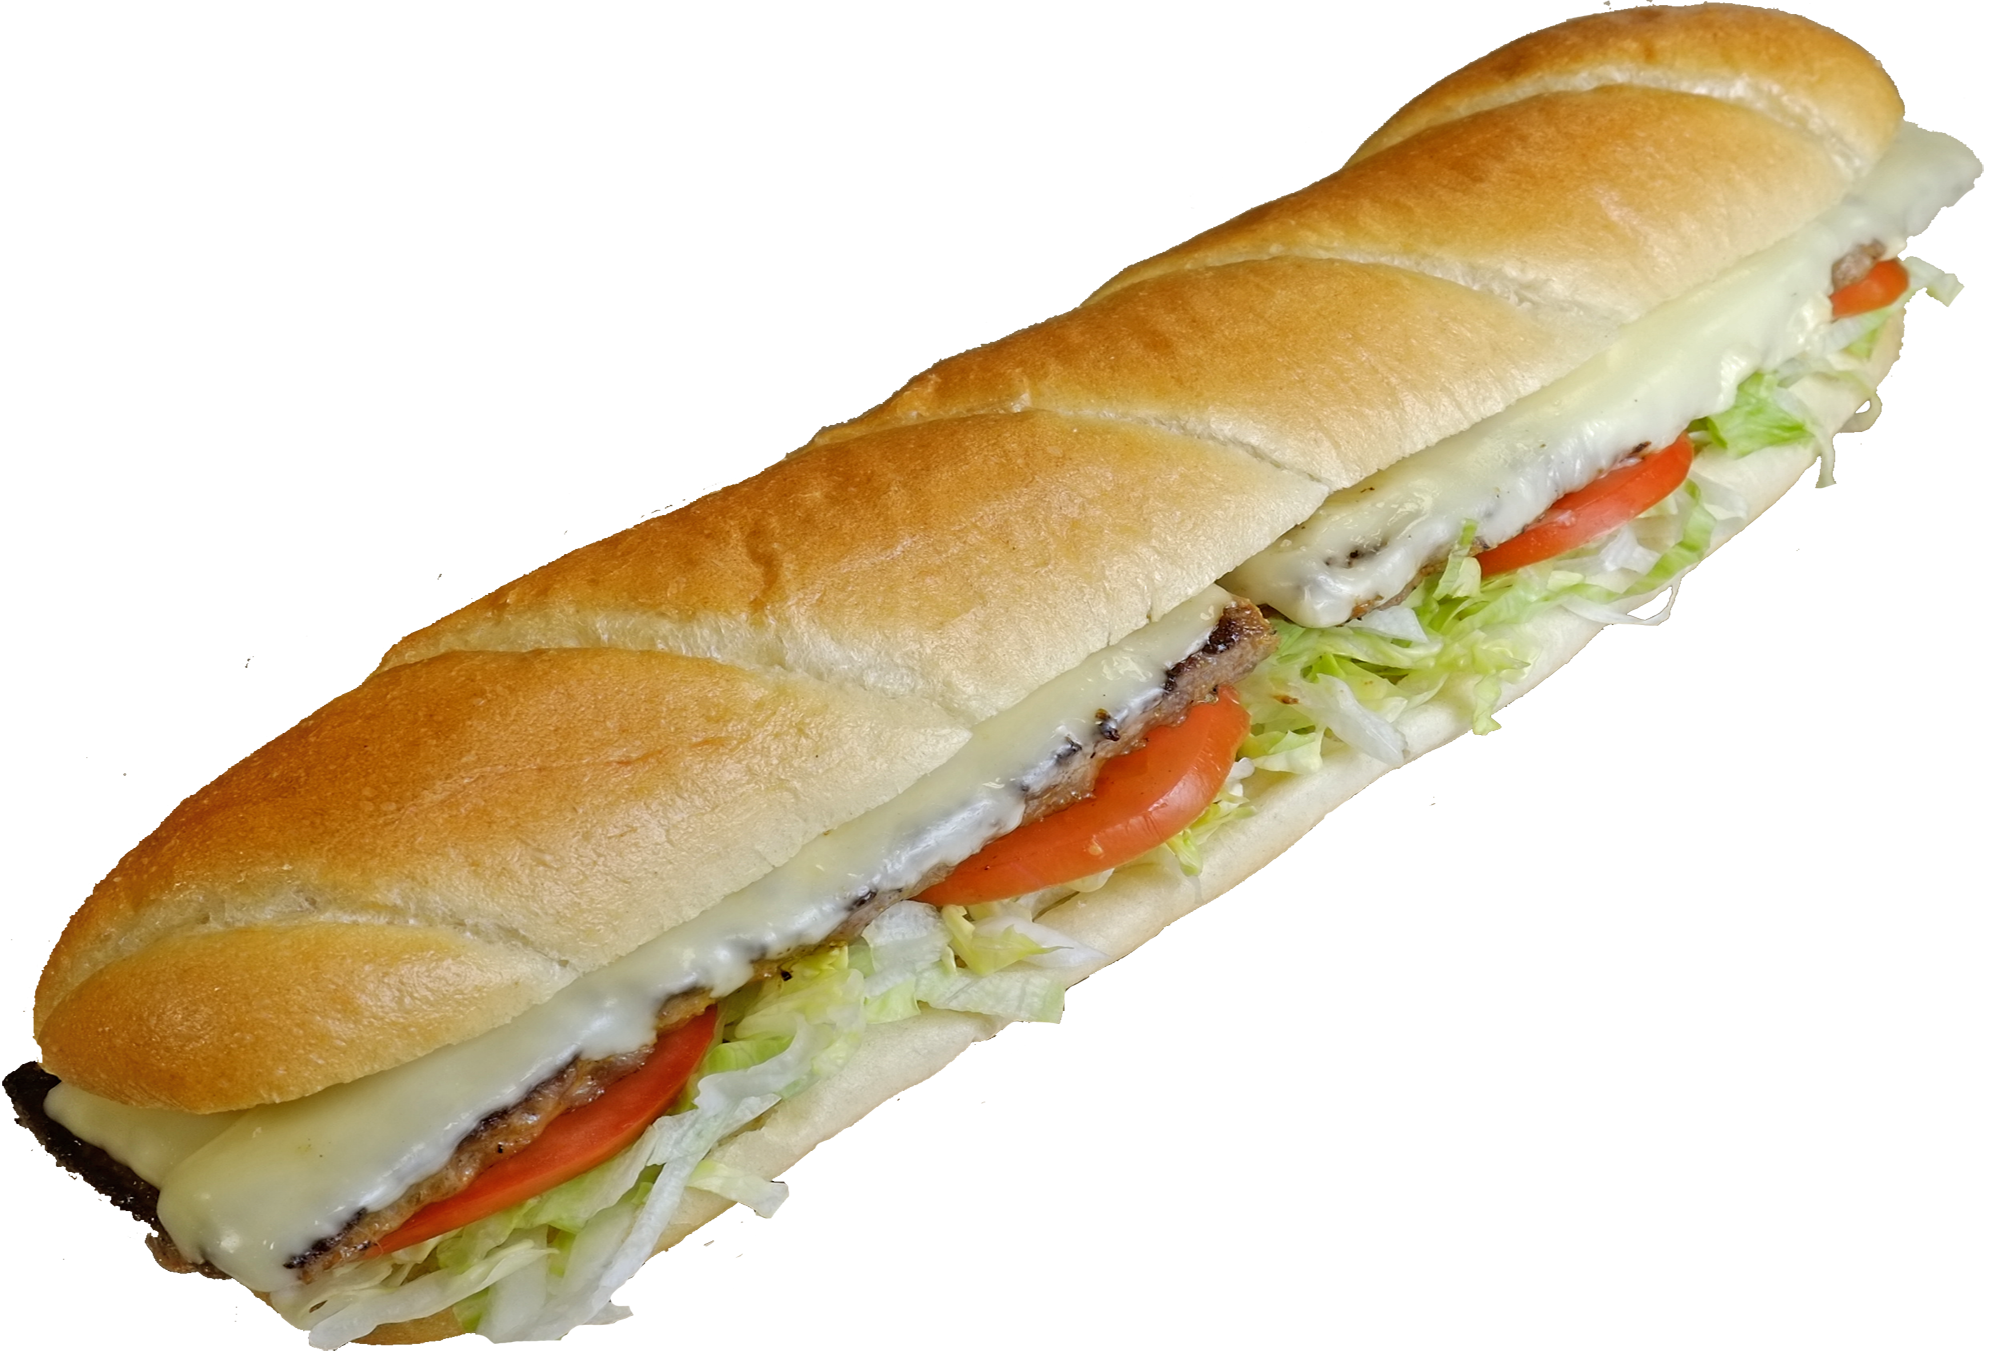 12 Inch Sausage Sub